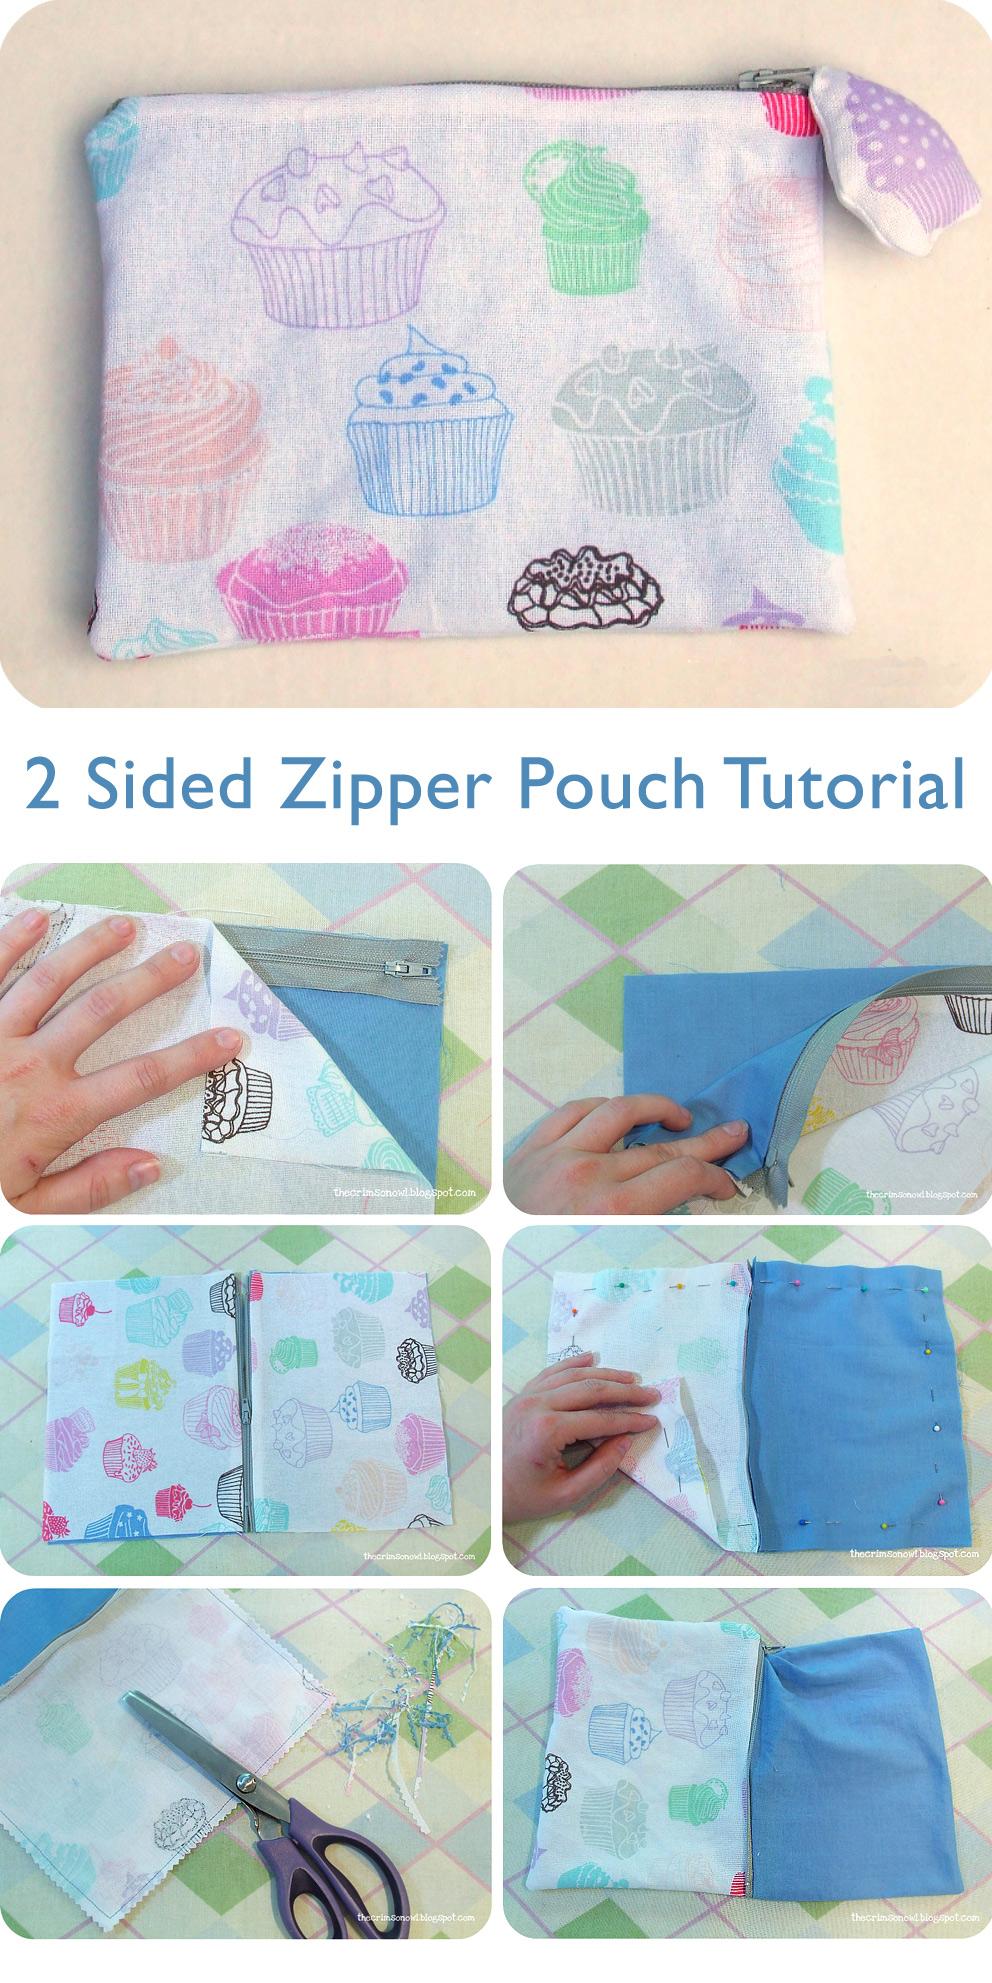 2 Sided Zipper Pouch Tutorial